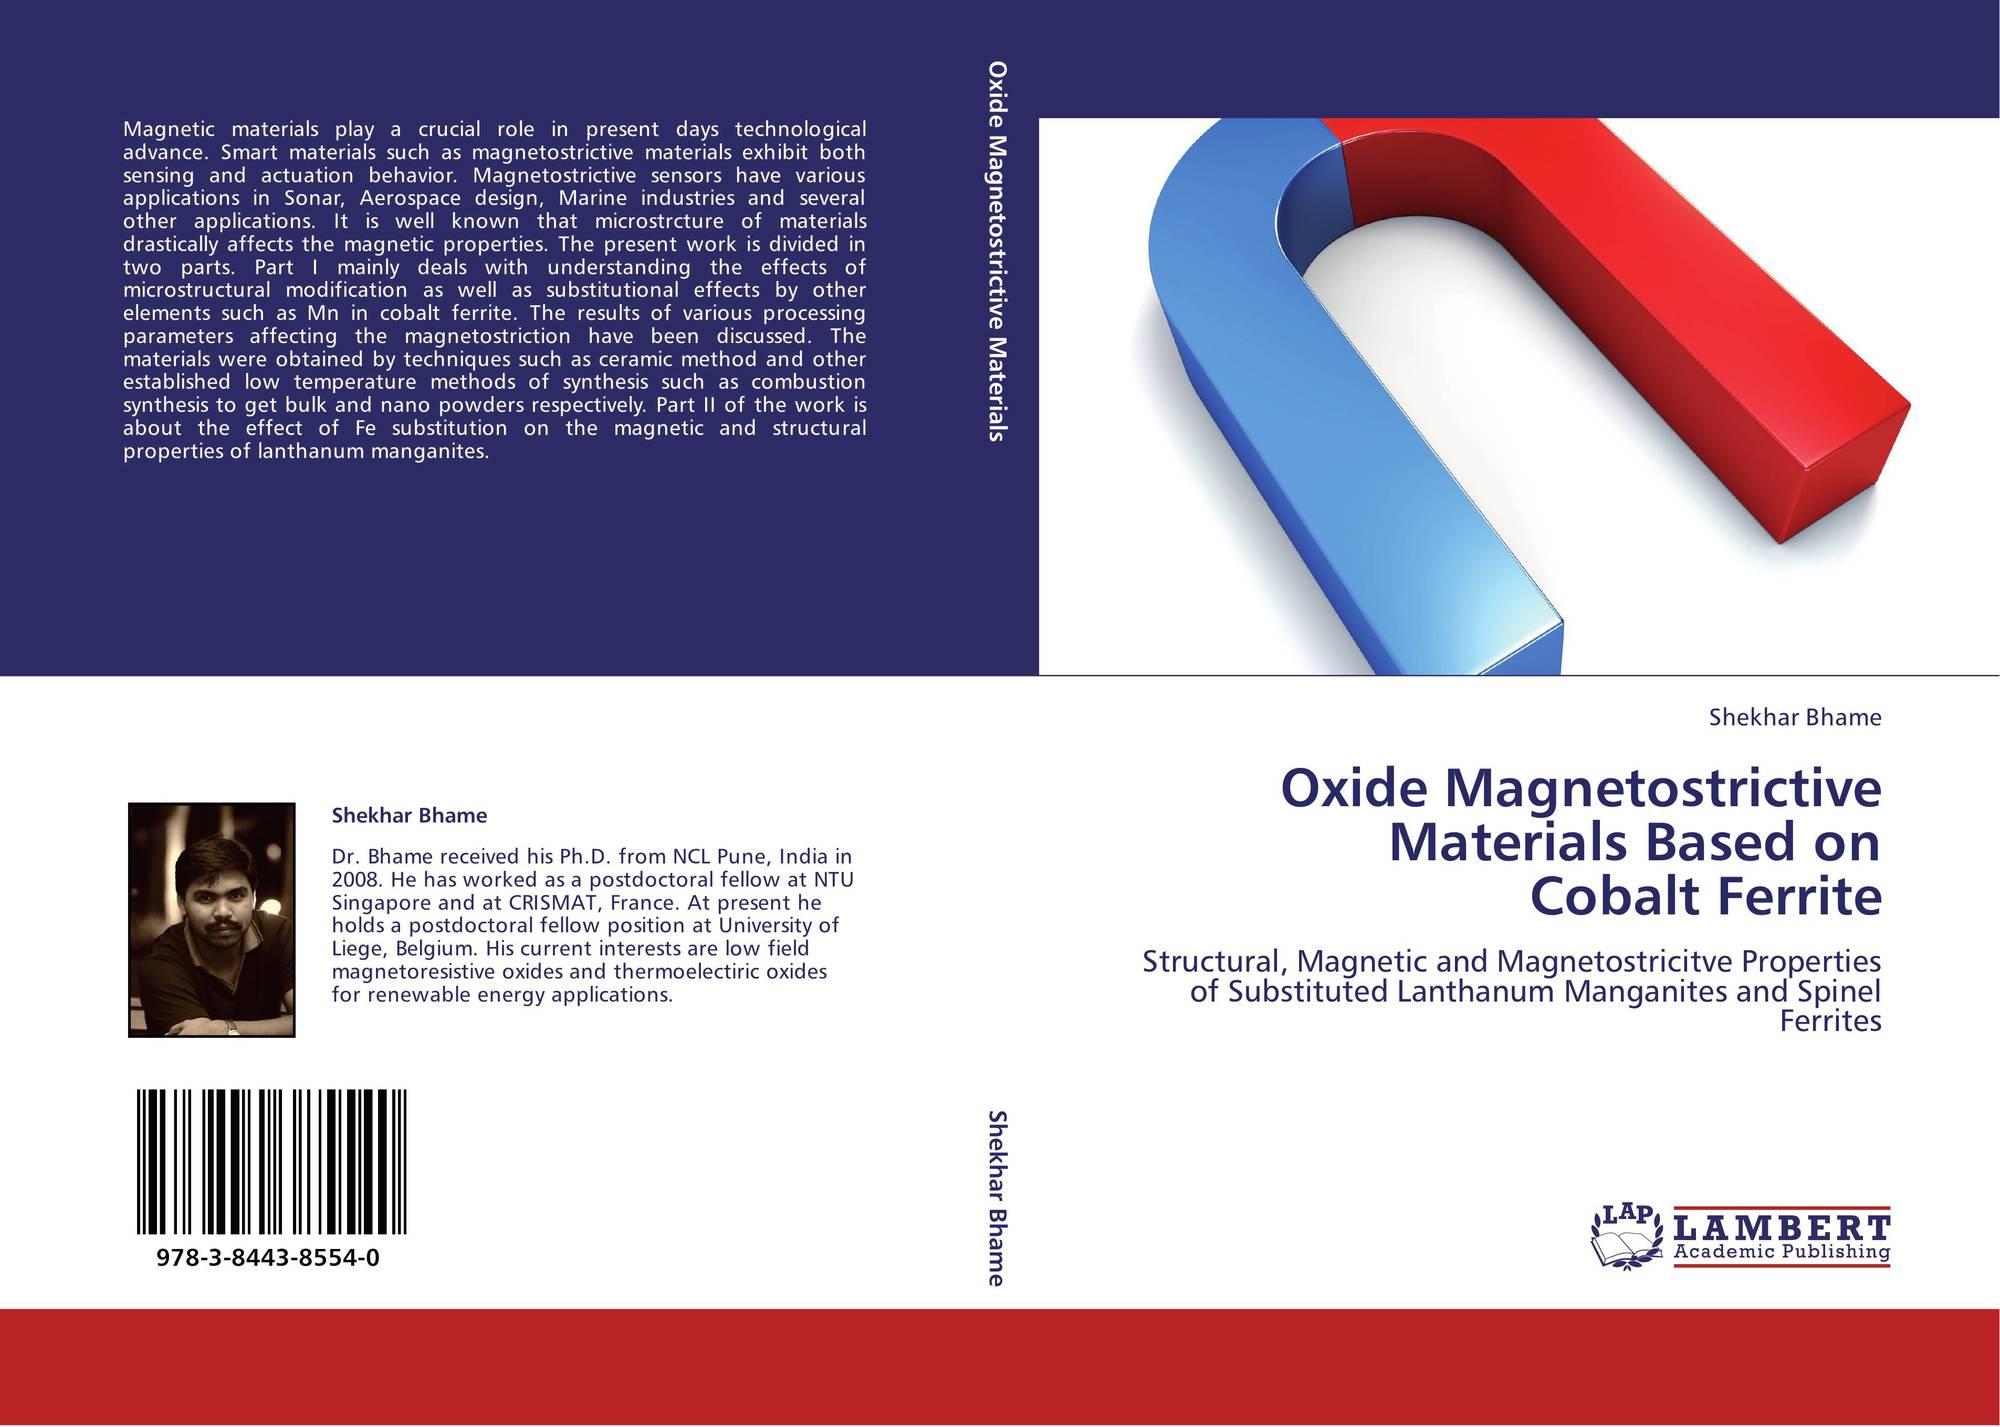 Oxide Magnetostrictive Materials Based on Cobalt Ferrite, 978-3-8443